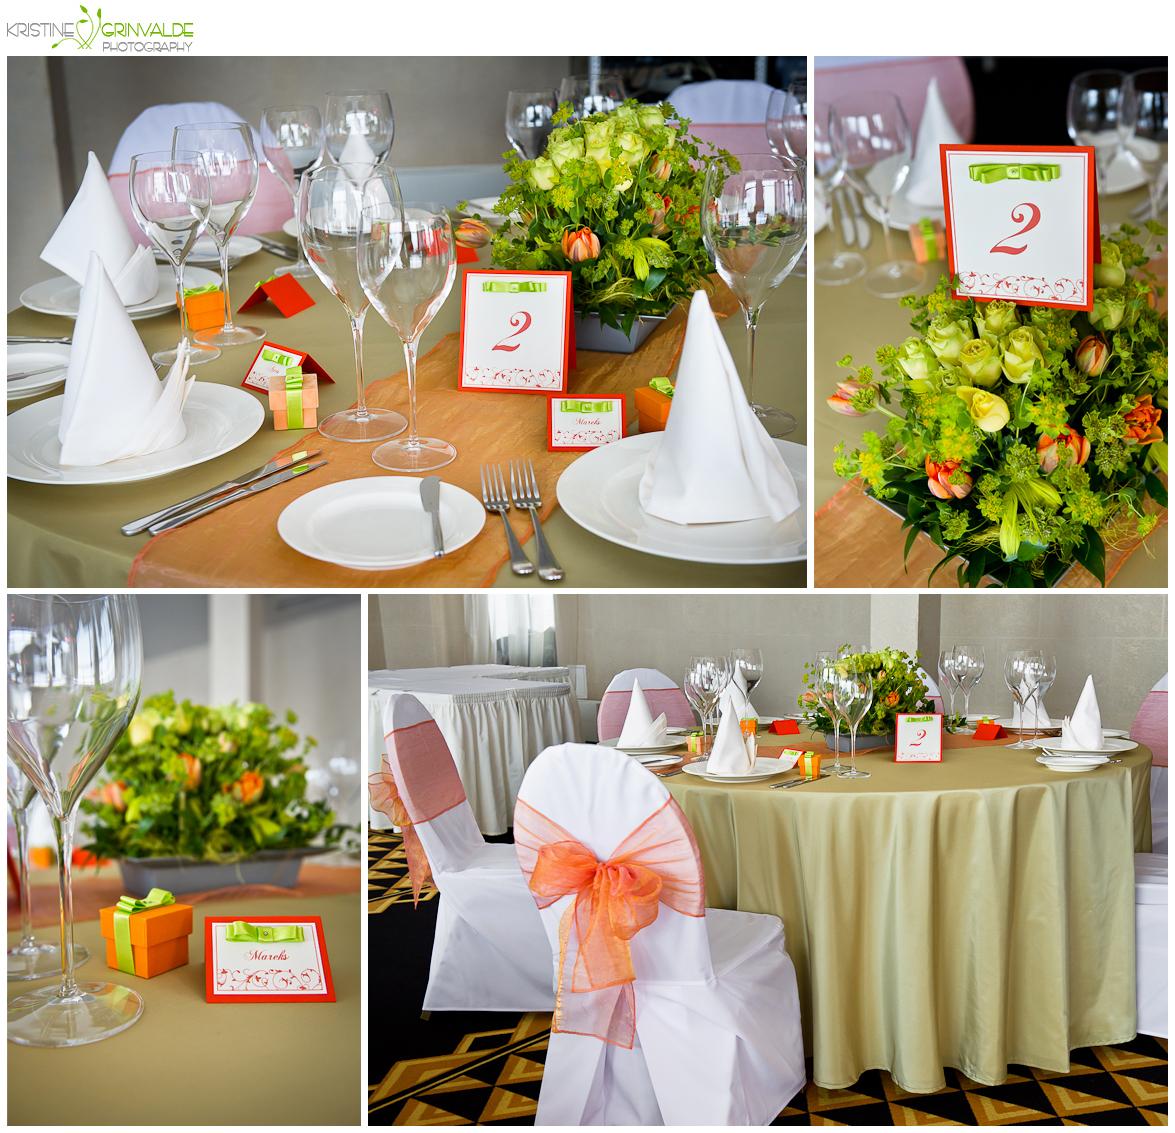 Wedding decoration ideas orange orange wedding themes orange wedding decoration ideas orange green orange wedding decorations flowers junglespirit Gallery